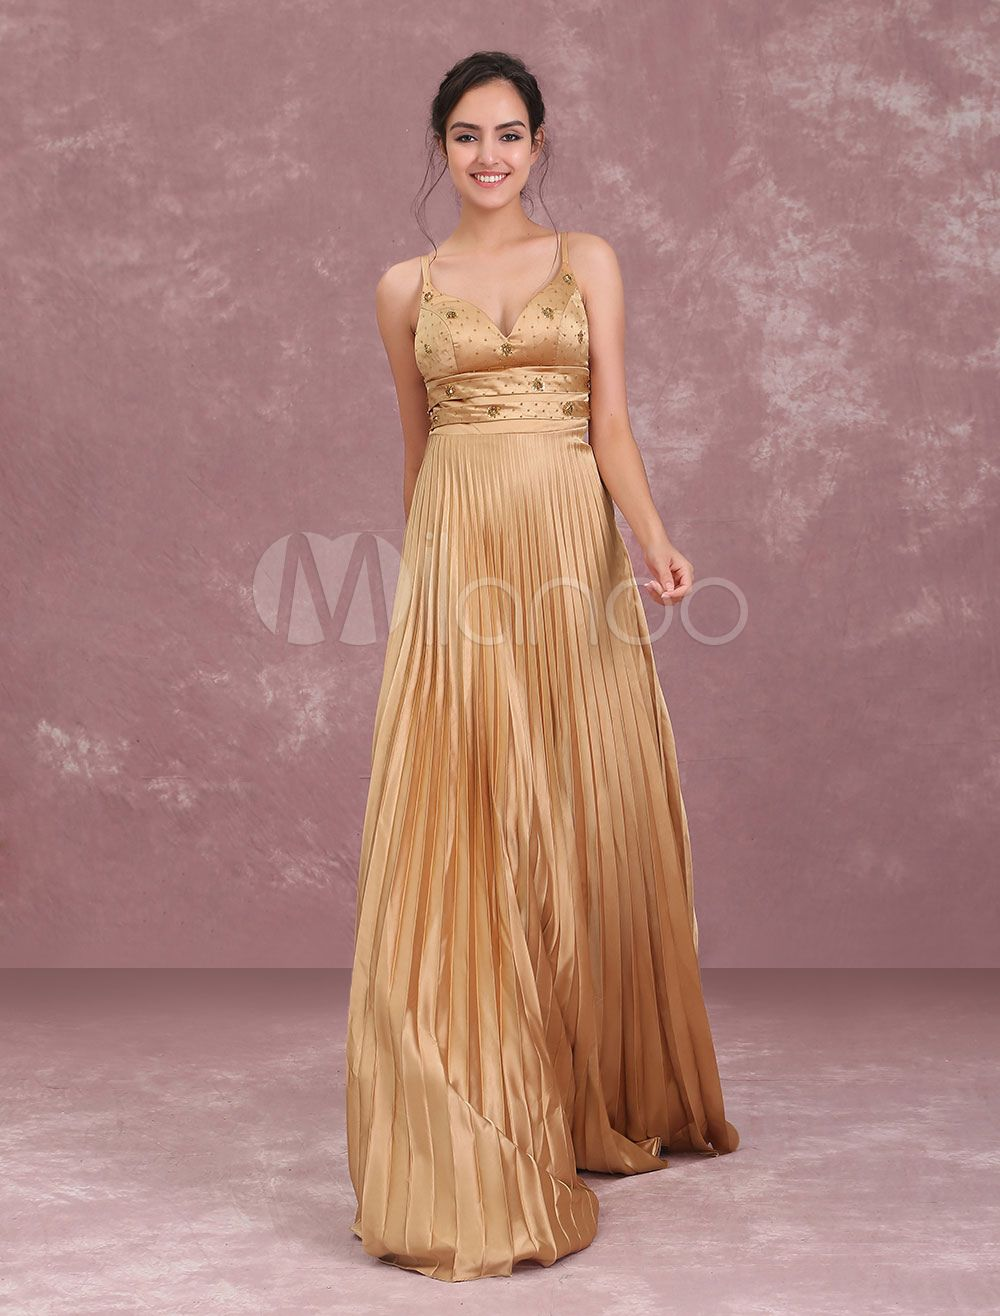 bfd9660210e Long Homecoming Dresses Light Gold Pleated Satin Prom Dress Spaghetti  Straps Beaded Floor Length Formal Slip Dress  Pleated